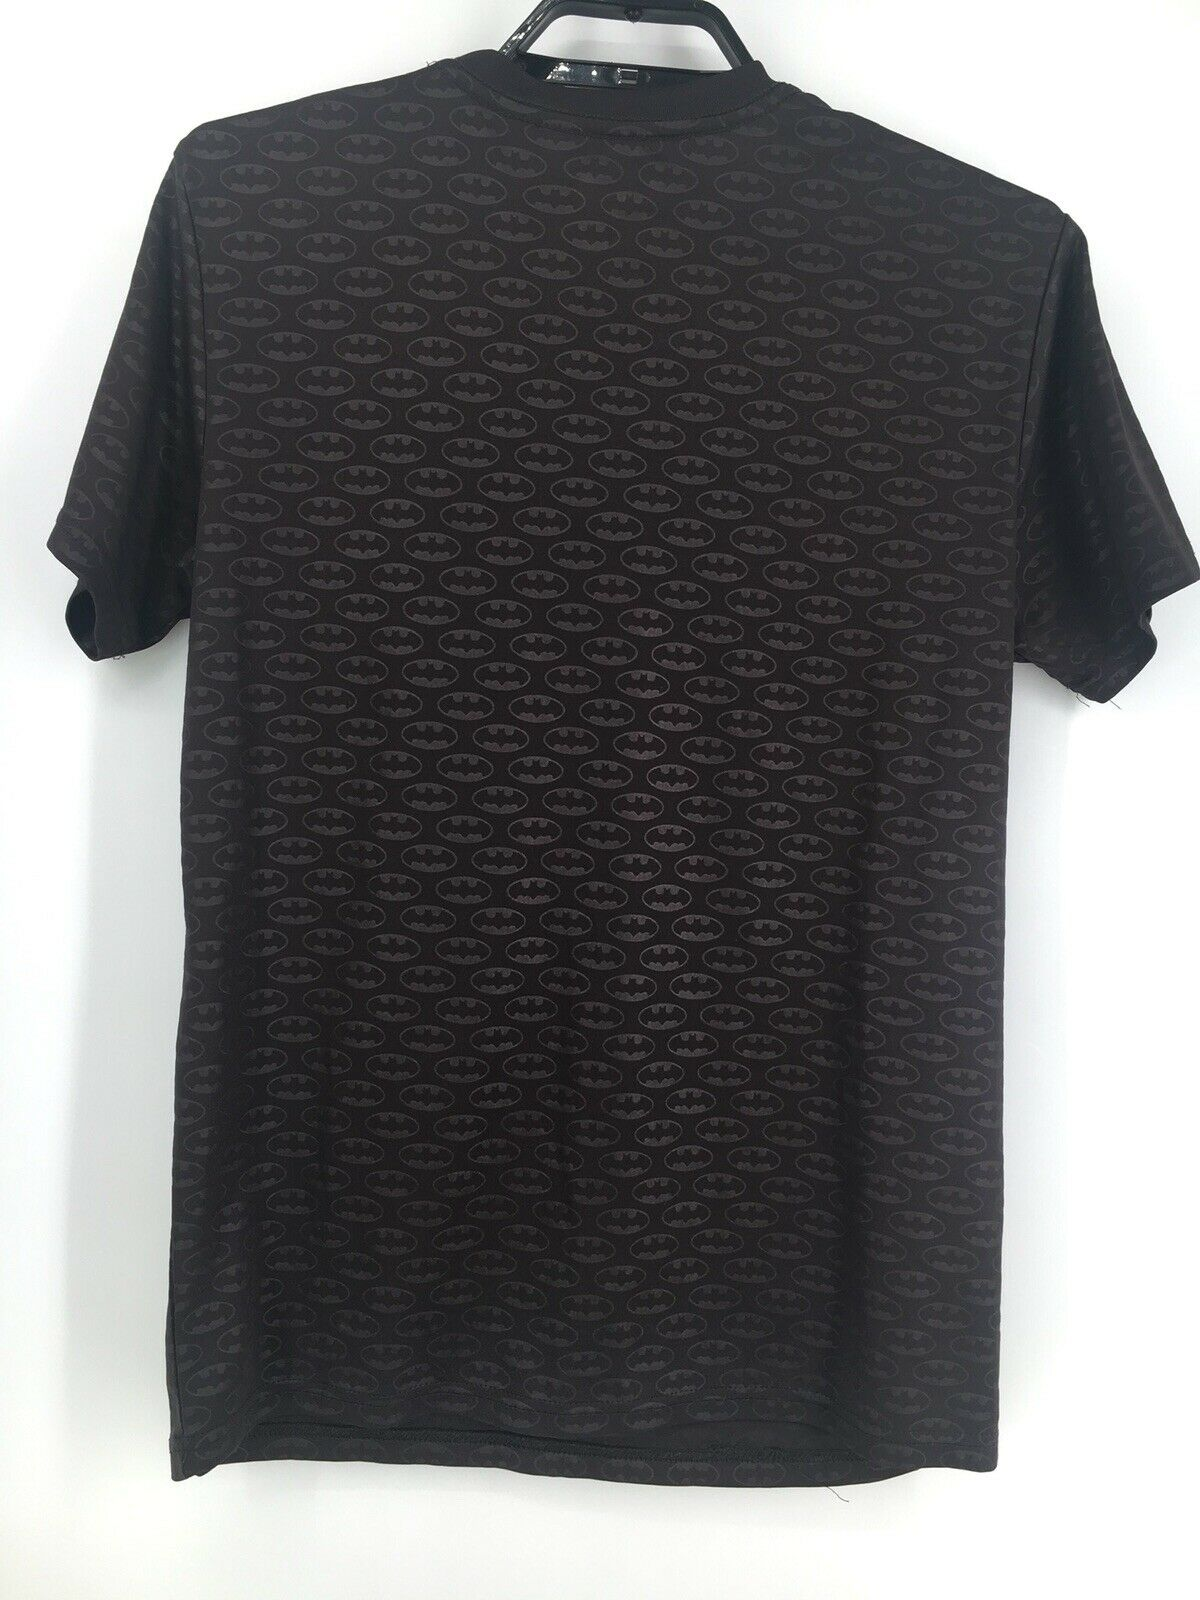 Batman Black T Shirt Mens Size S, Small - $18.55